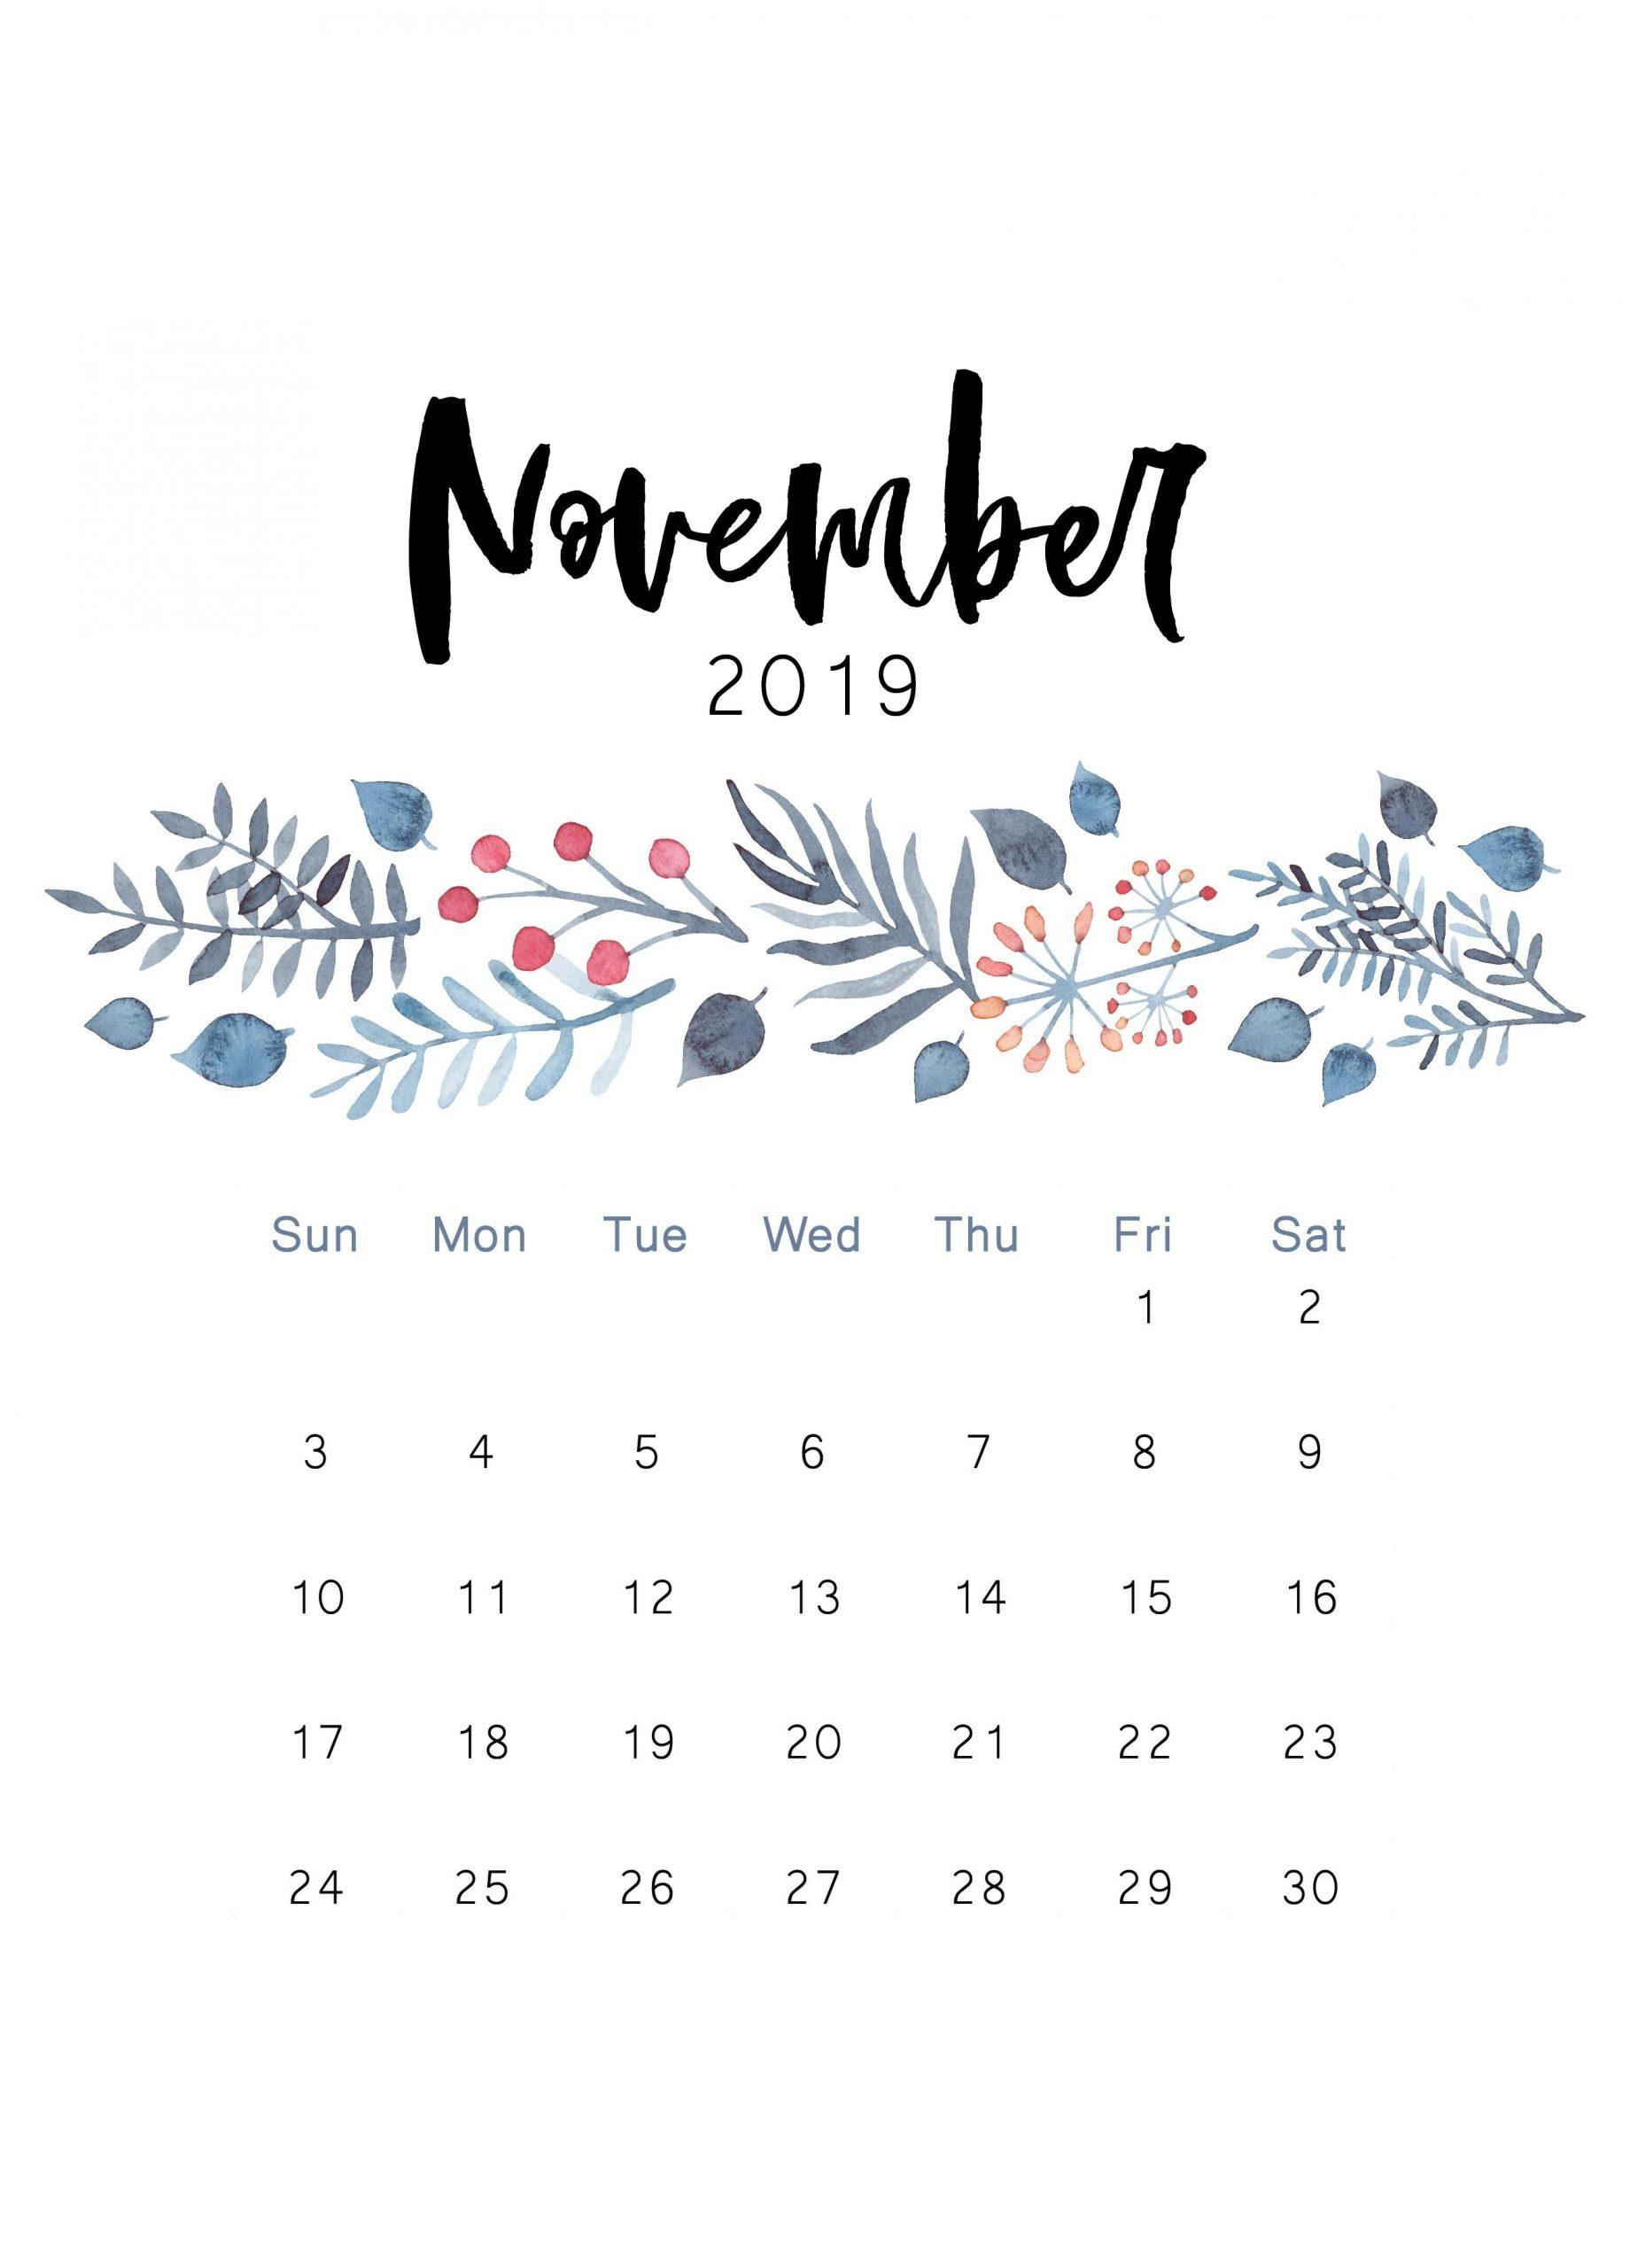 Free 2019 Printable Calendar - The Cactus Creative